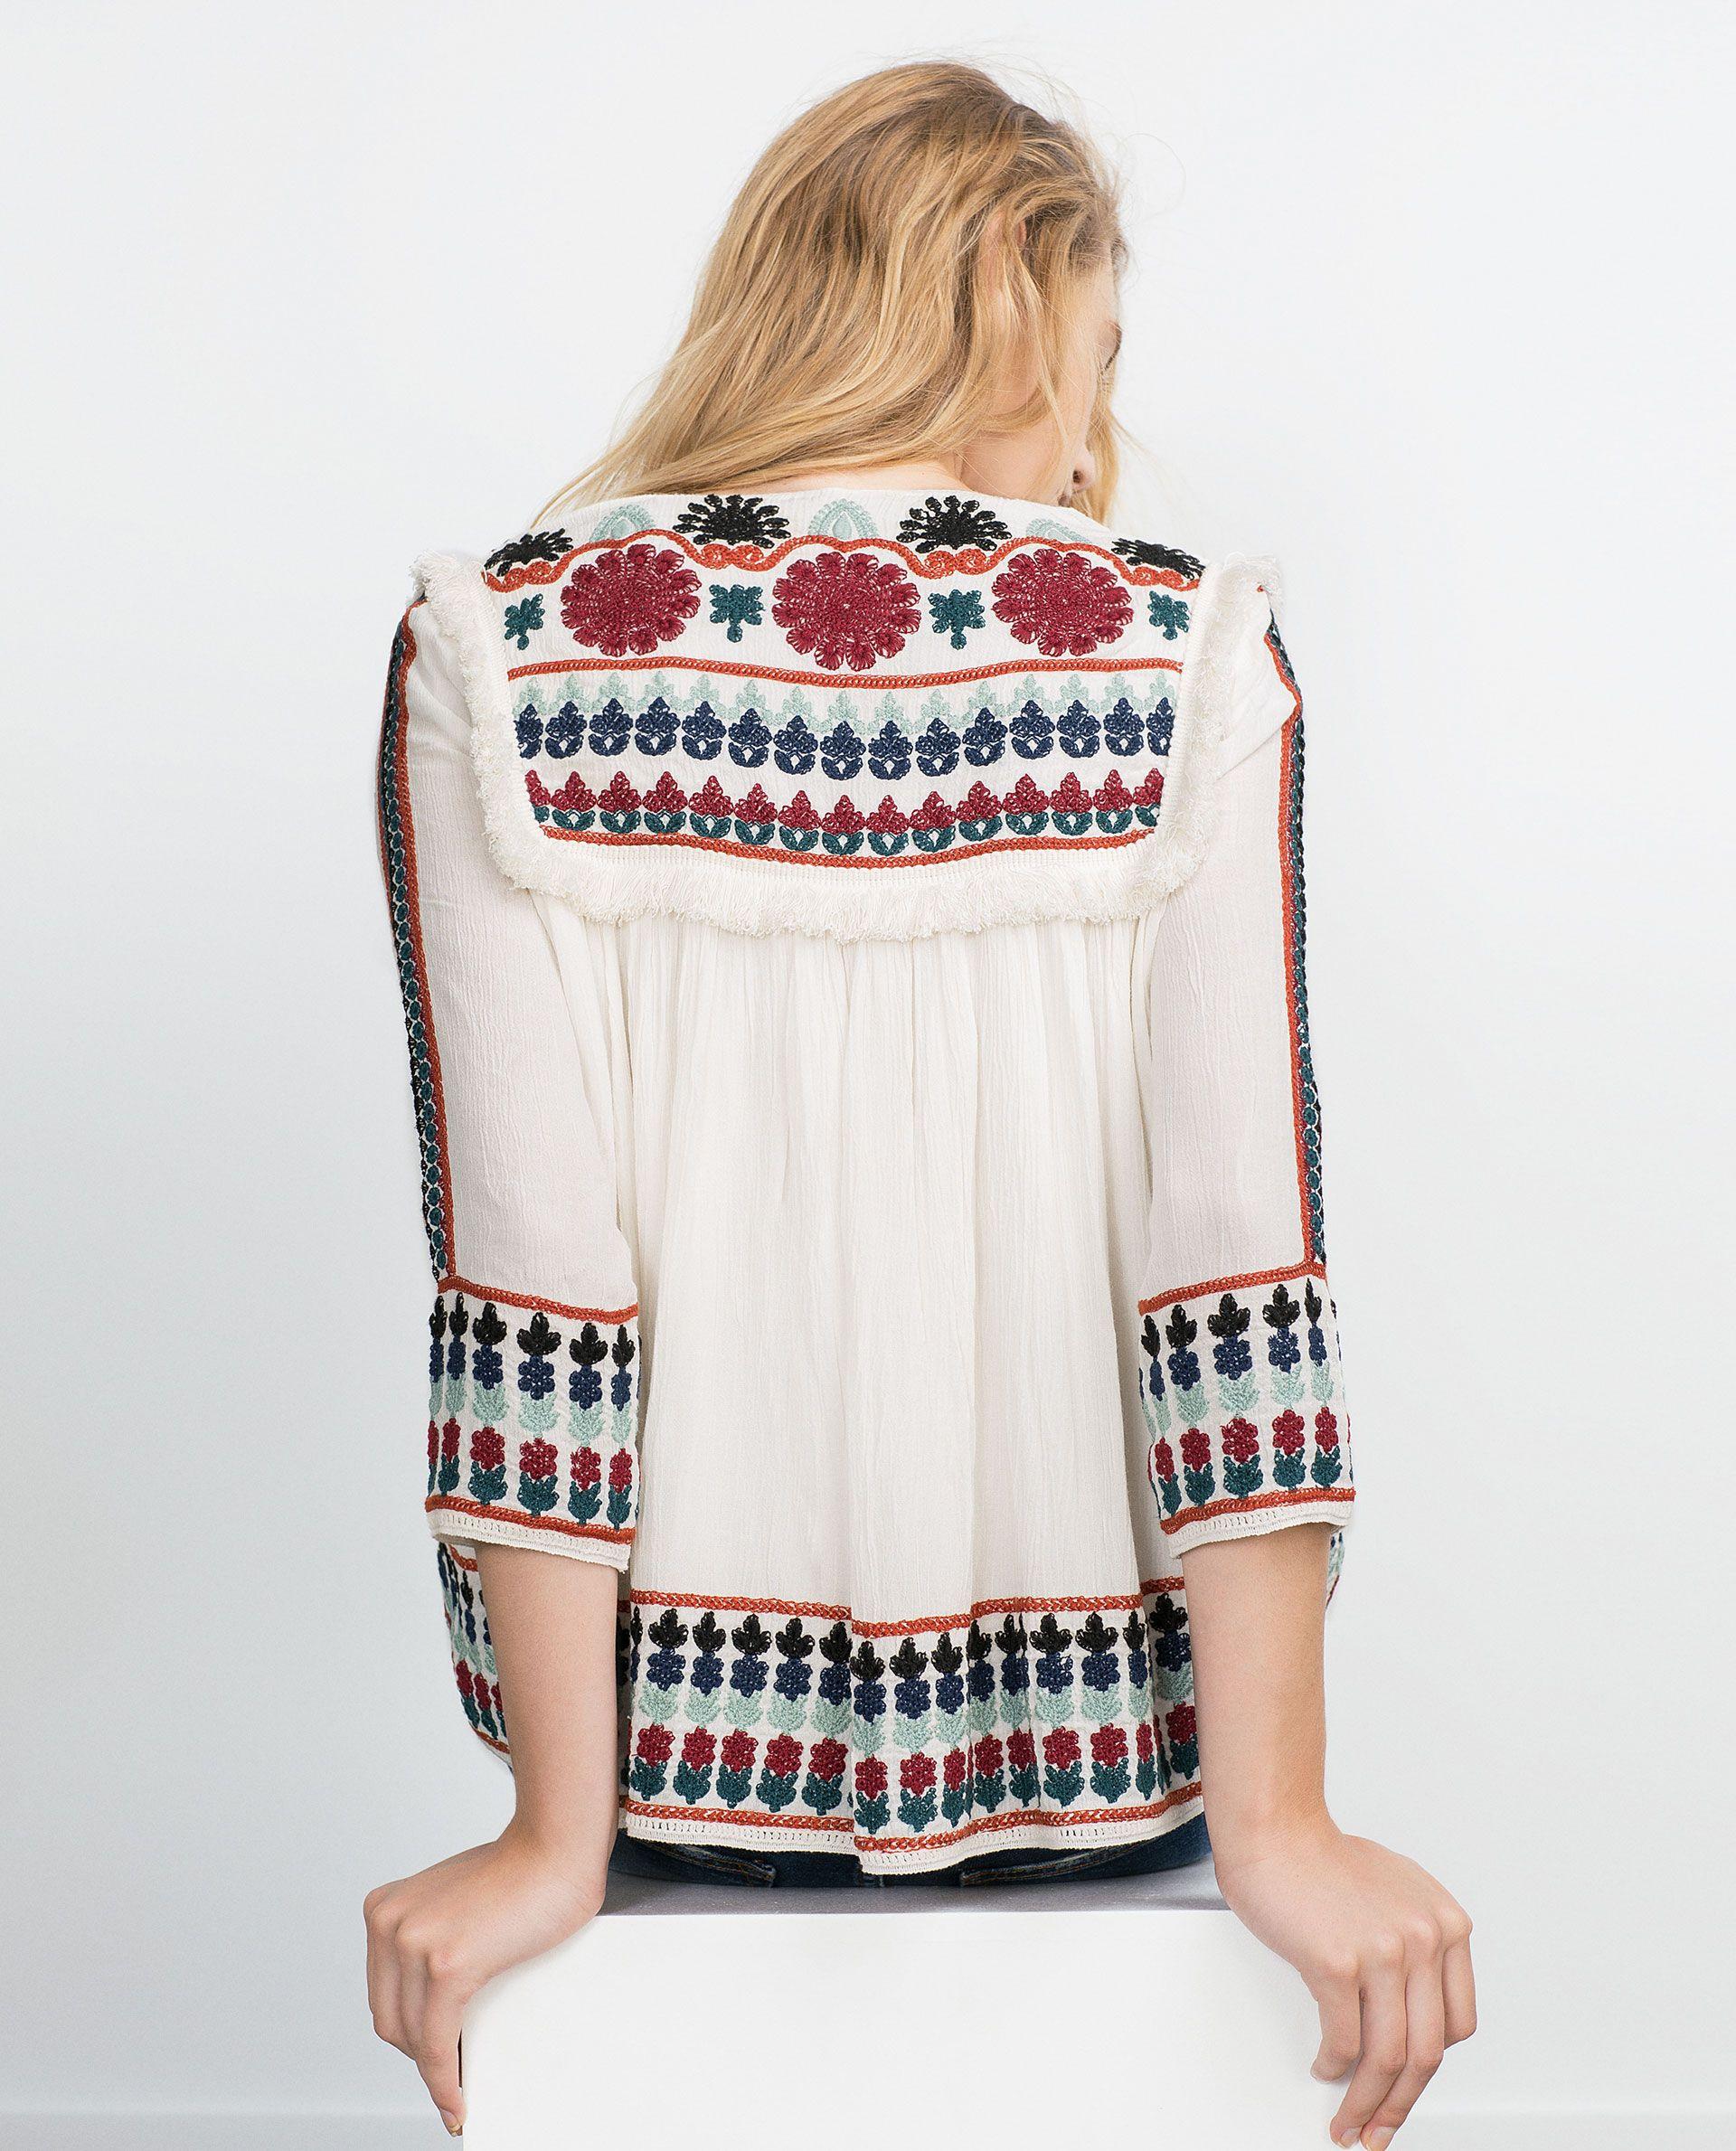 ZARA MUJER CHAQUETA BORDADA | Shirt blouses, Embroidered